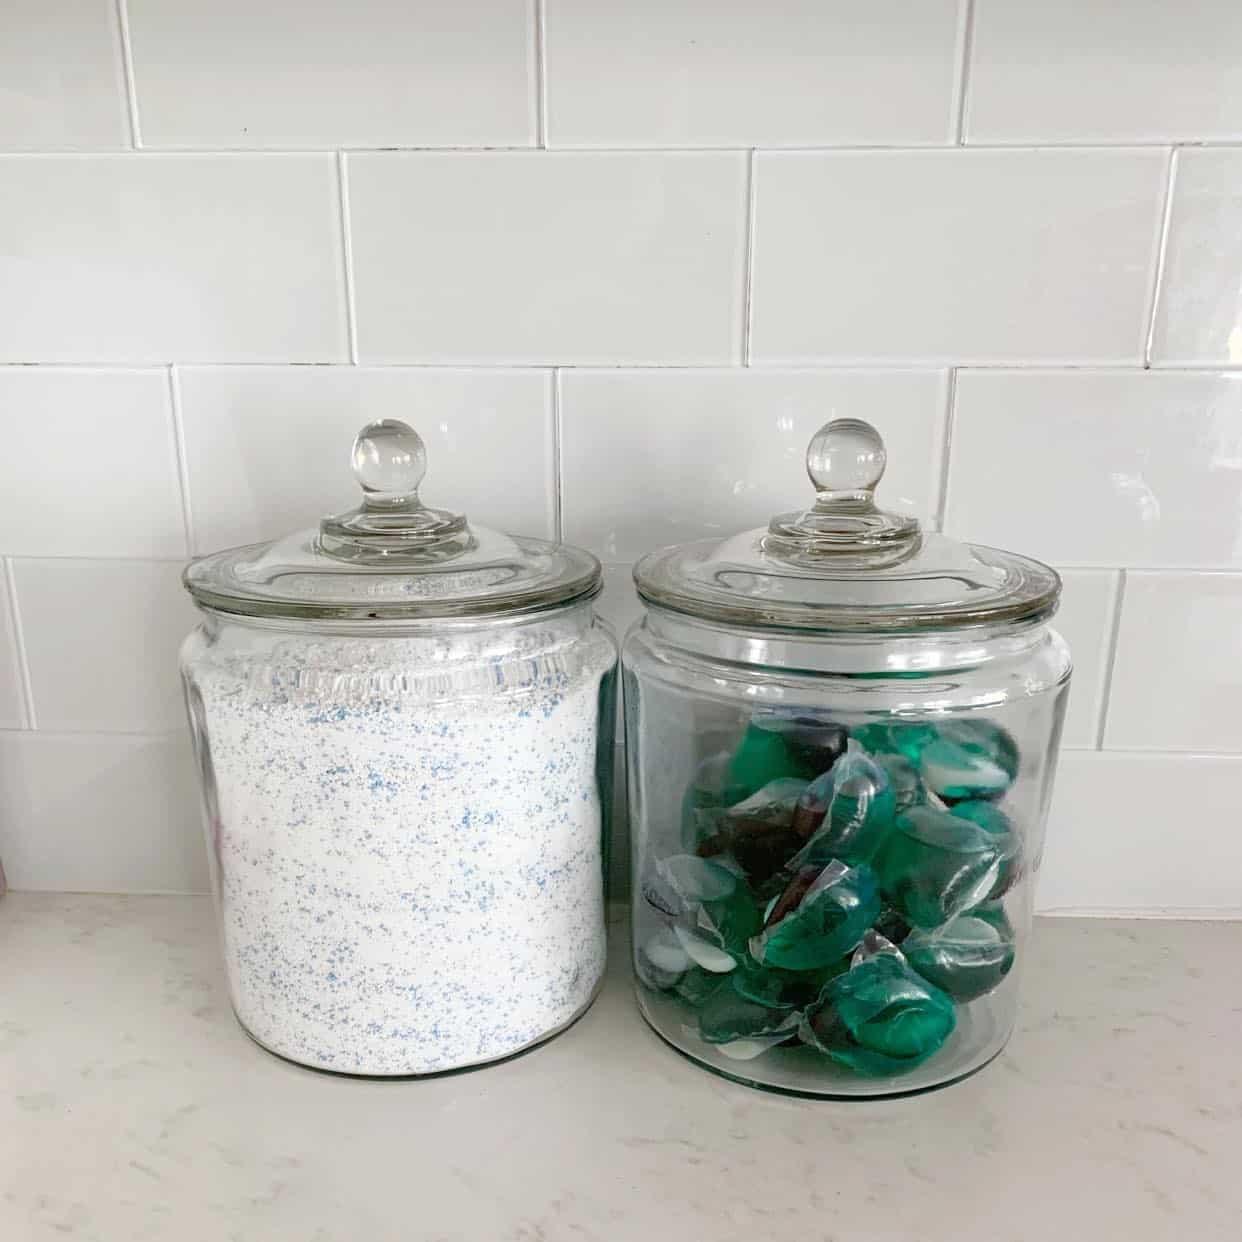 jars for laundry detergent